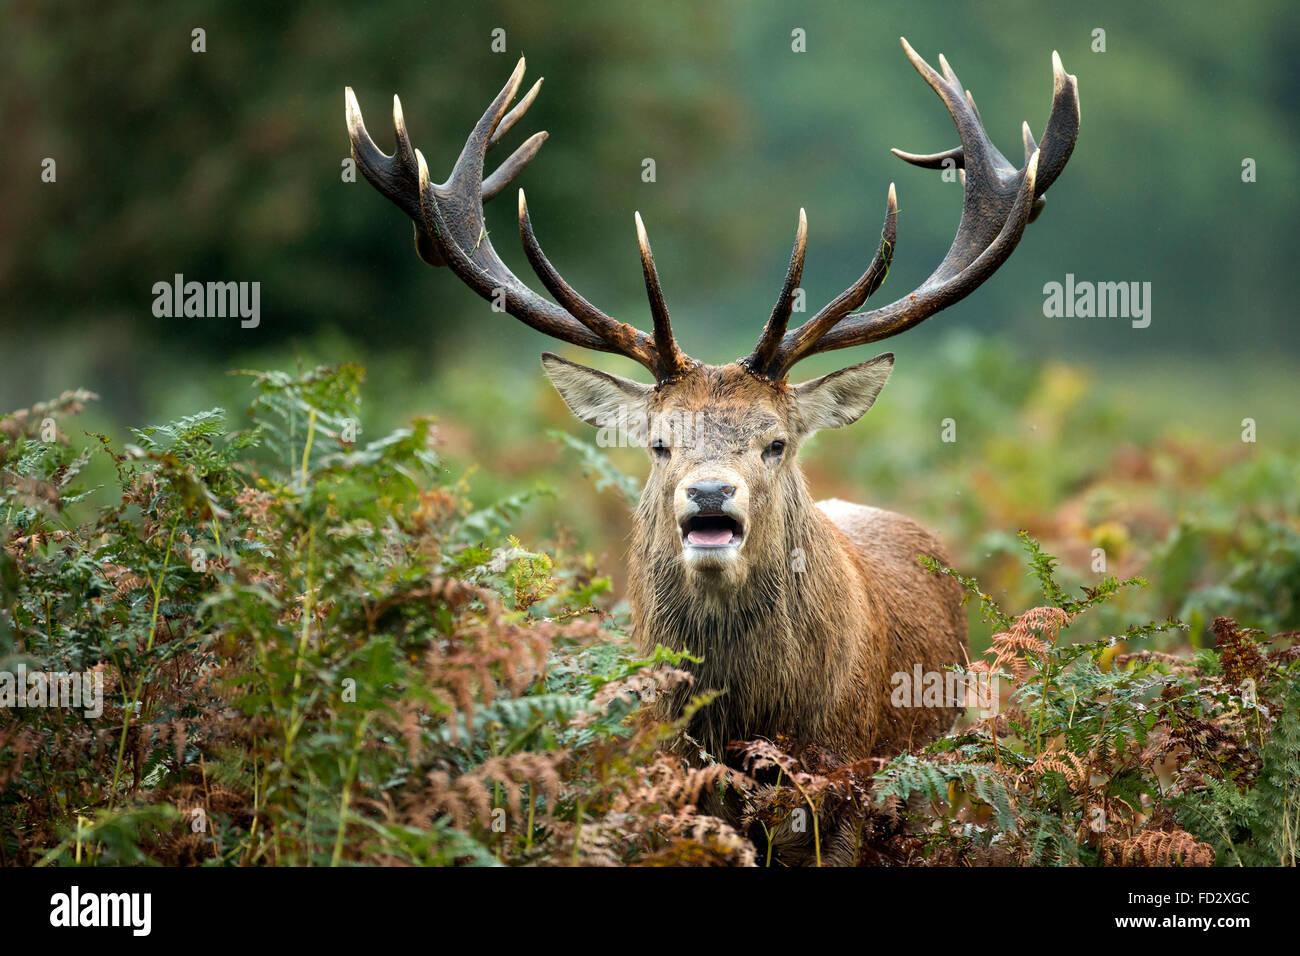 Red deer (Cervus elaphus) stag standing amongst bracken during rutting season - Stock Image